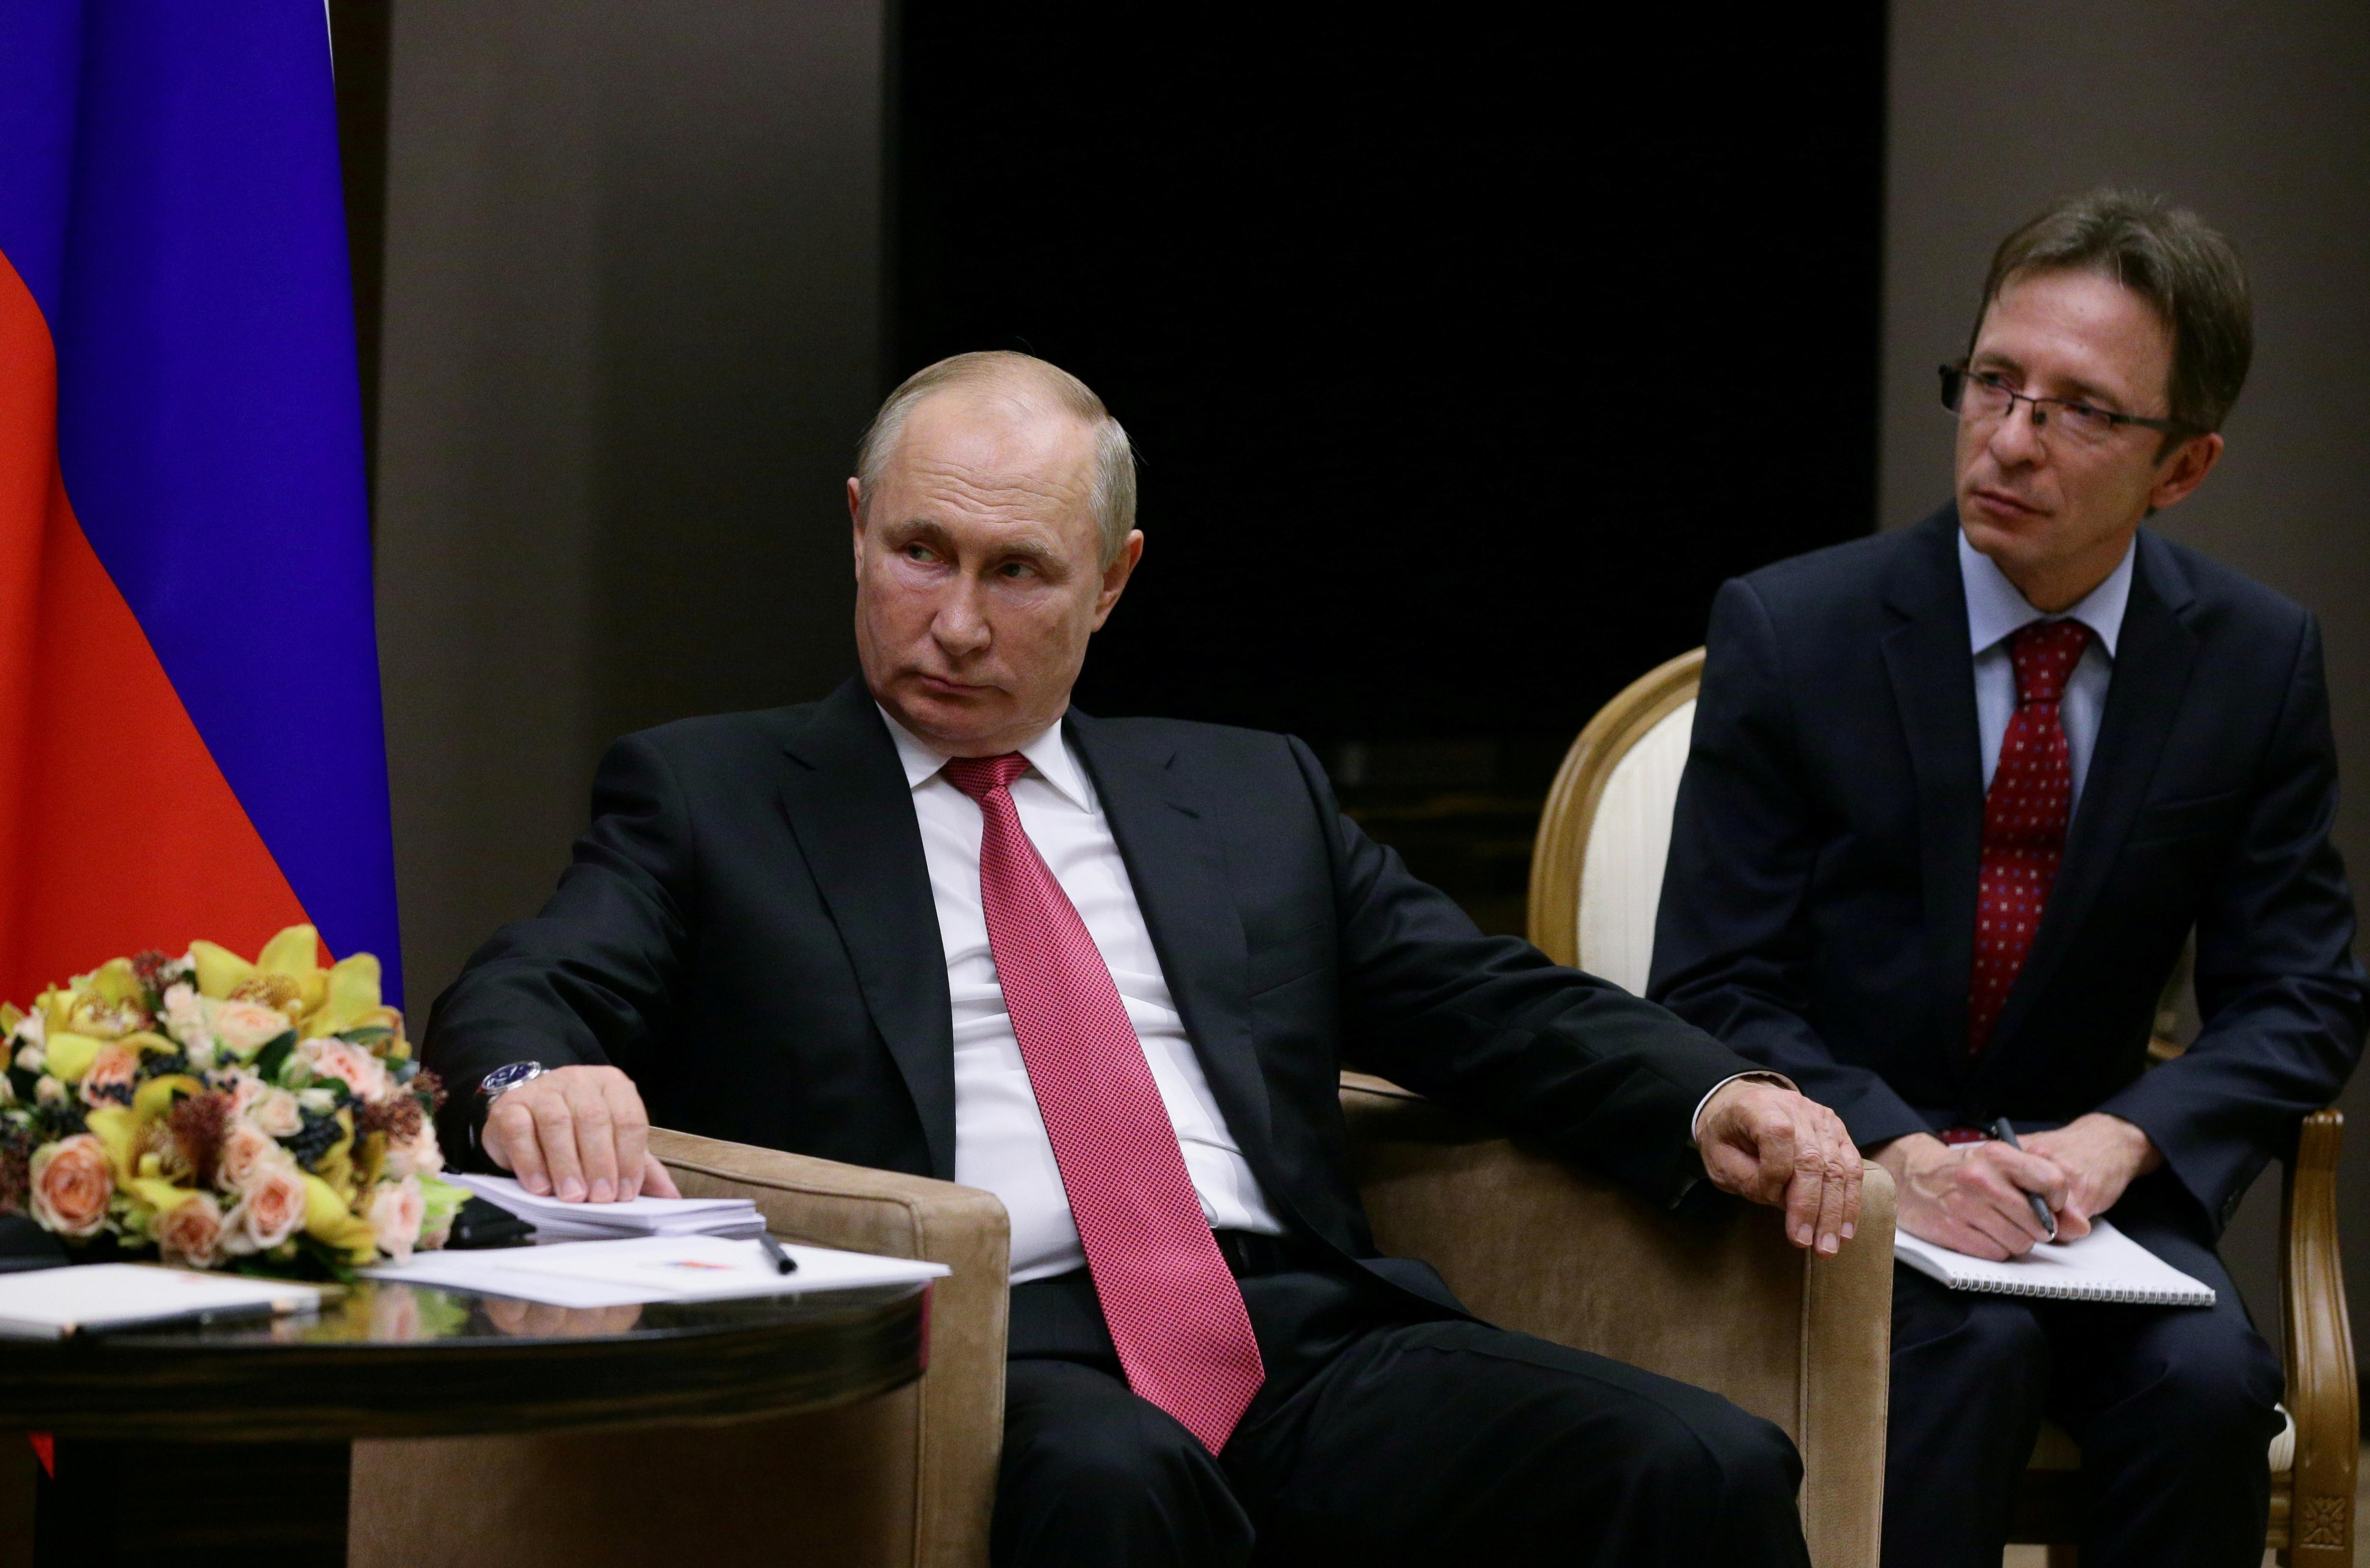 Russian President Vladimir Putin attends a meeting with Turkish President Tayyip Erdogan in Sochi, Russia September 29, 2021. Sputnik/Vladimir Smirnov/Pool via REUTERS